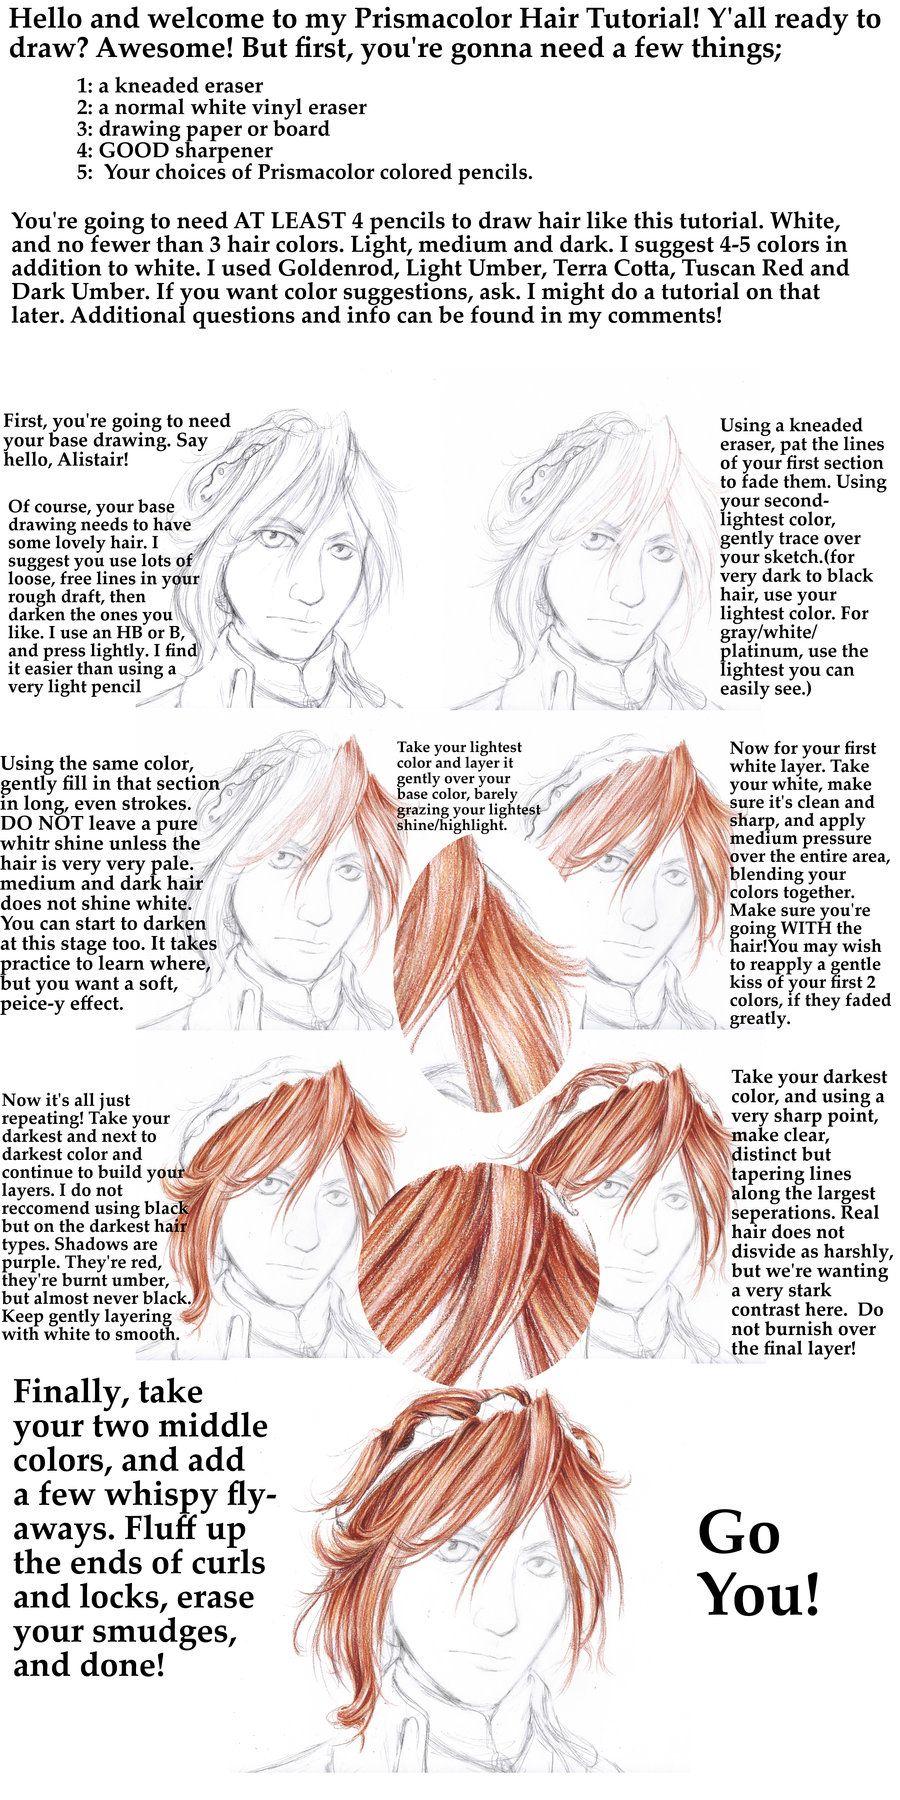 Prismacolor pencil hair tutorial by shondrea on deviantart